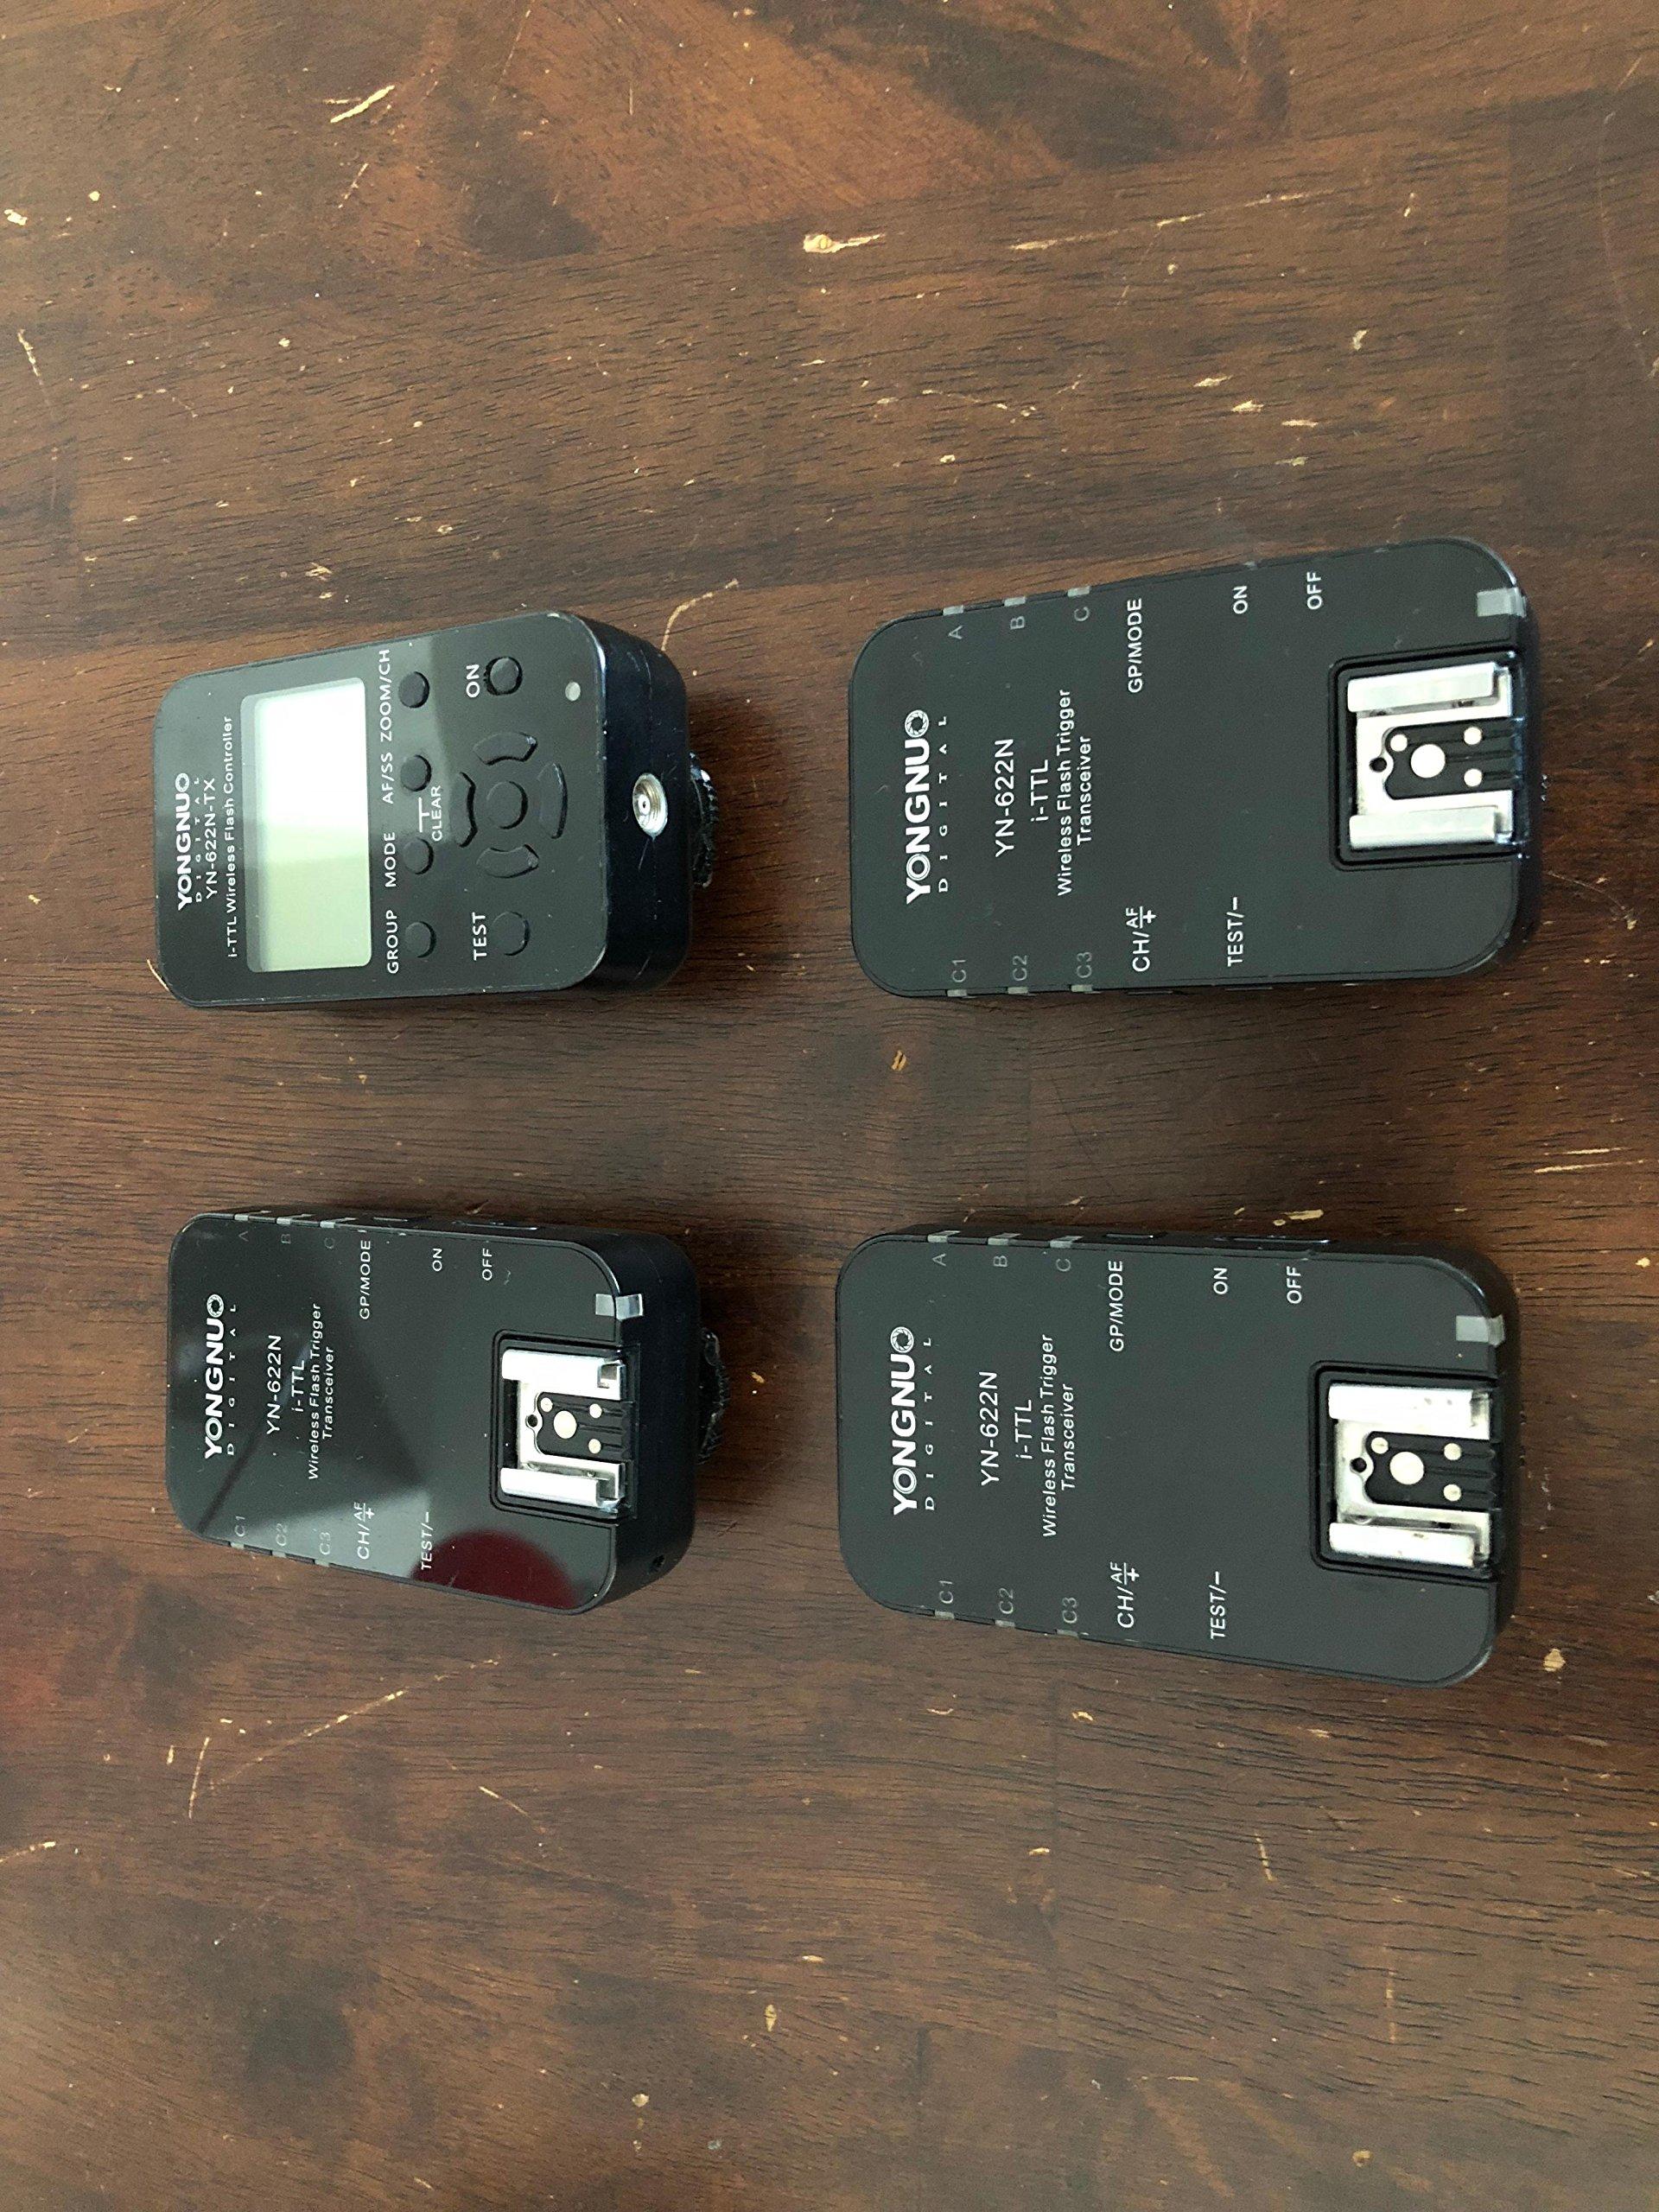 YONGNUO YN-622N 1 x TX + 2 x RX i-TTL LCD wireless flash controller wireless flash trigger transceiver DSLR for Nikon D70, D70S, D80, D90, D200, D300S, D600, D700, D800, D3000, D3100, D3200, D5000, D5100, D5200, D5300, D7000, D7100 by Yongnuo